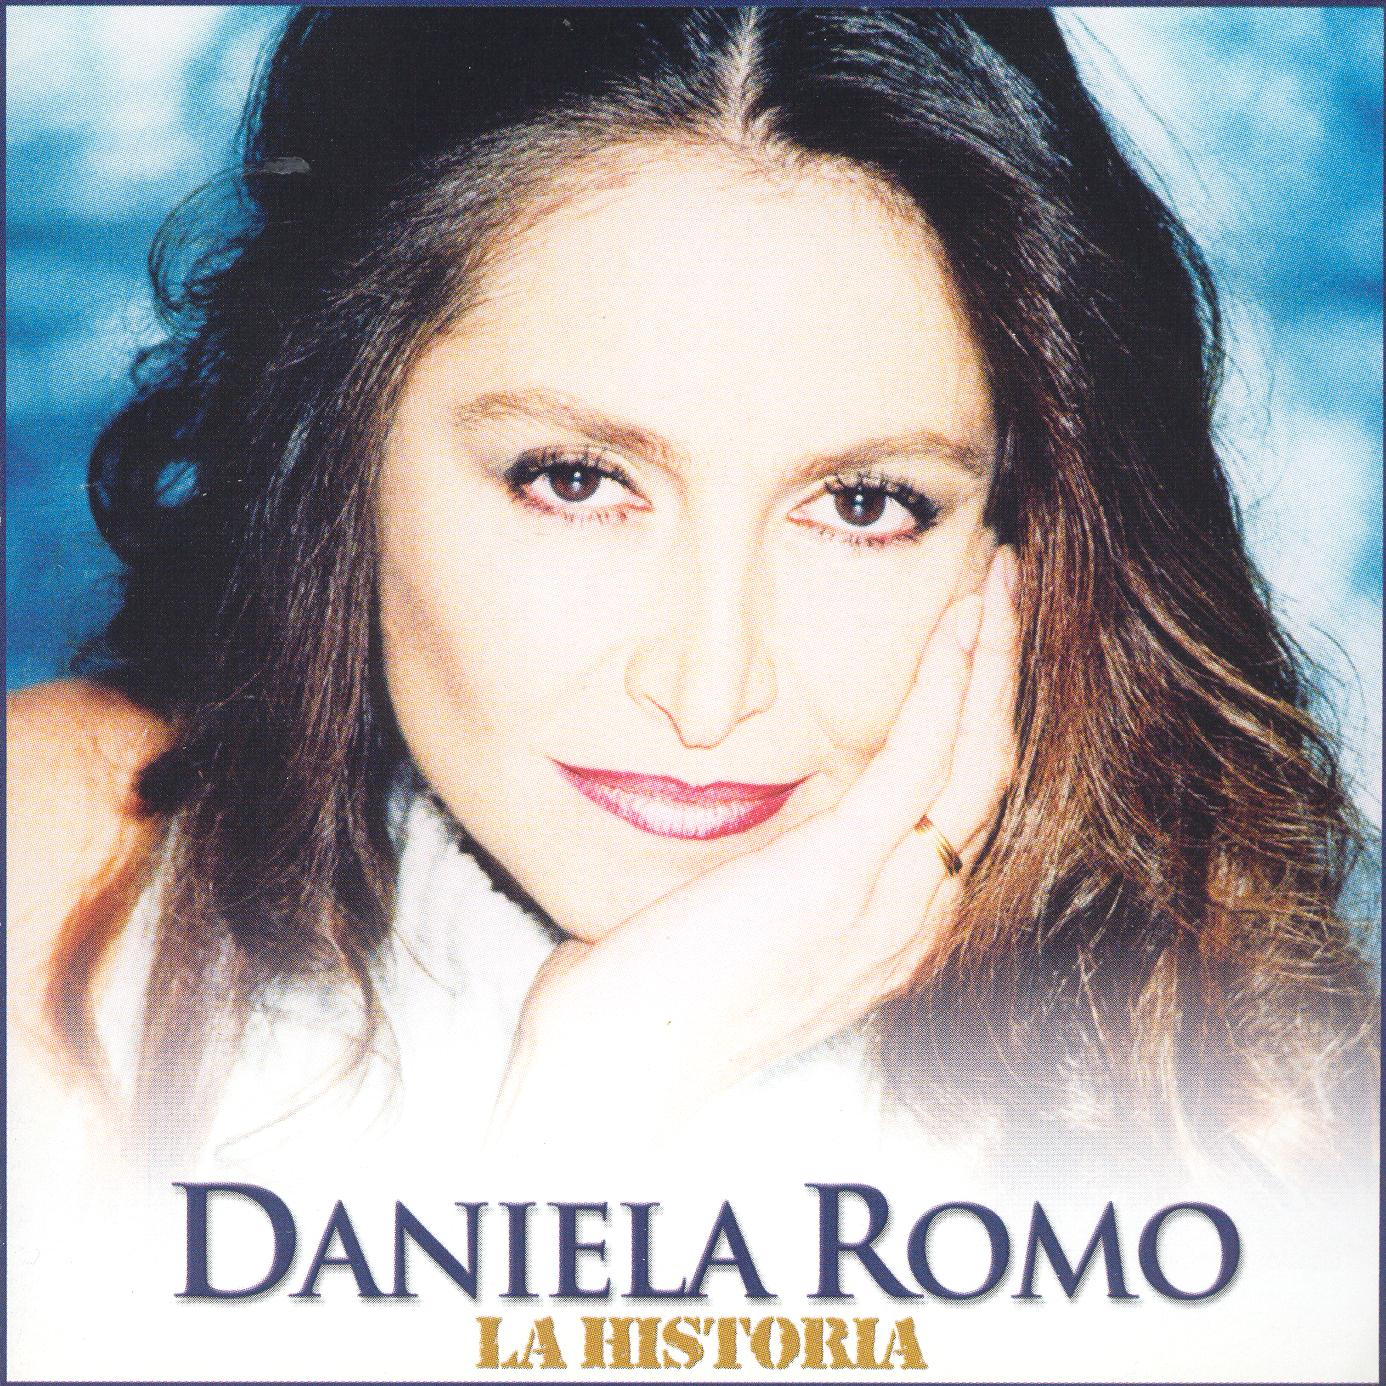 Daniela Romo: La Historia